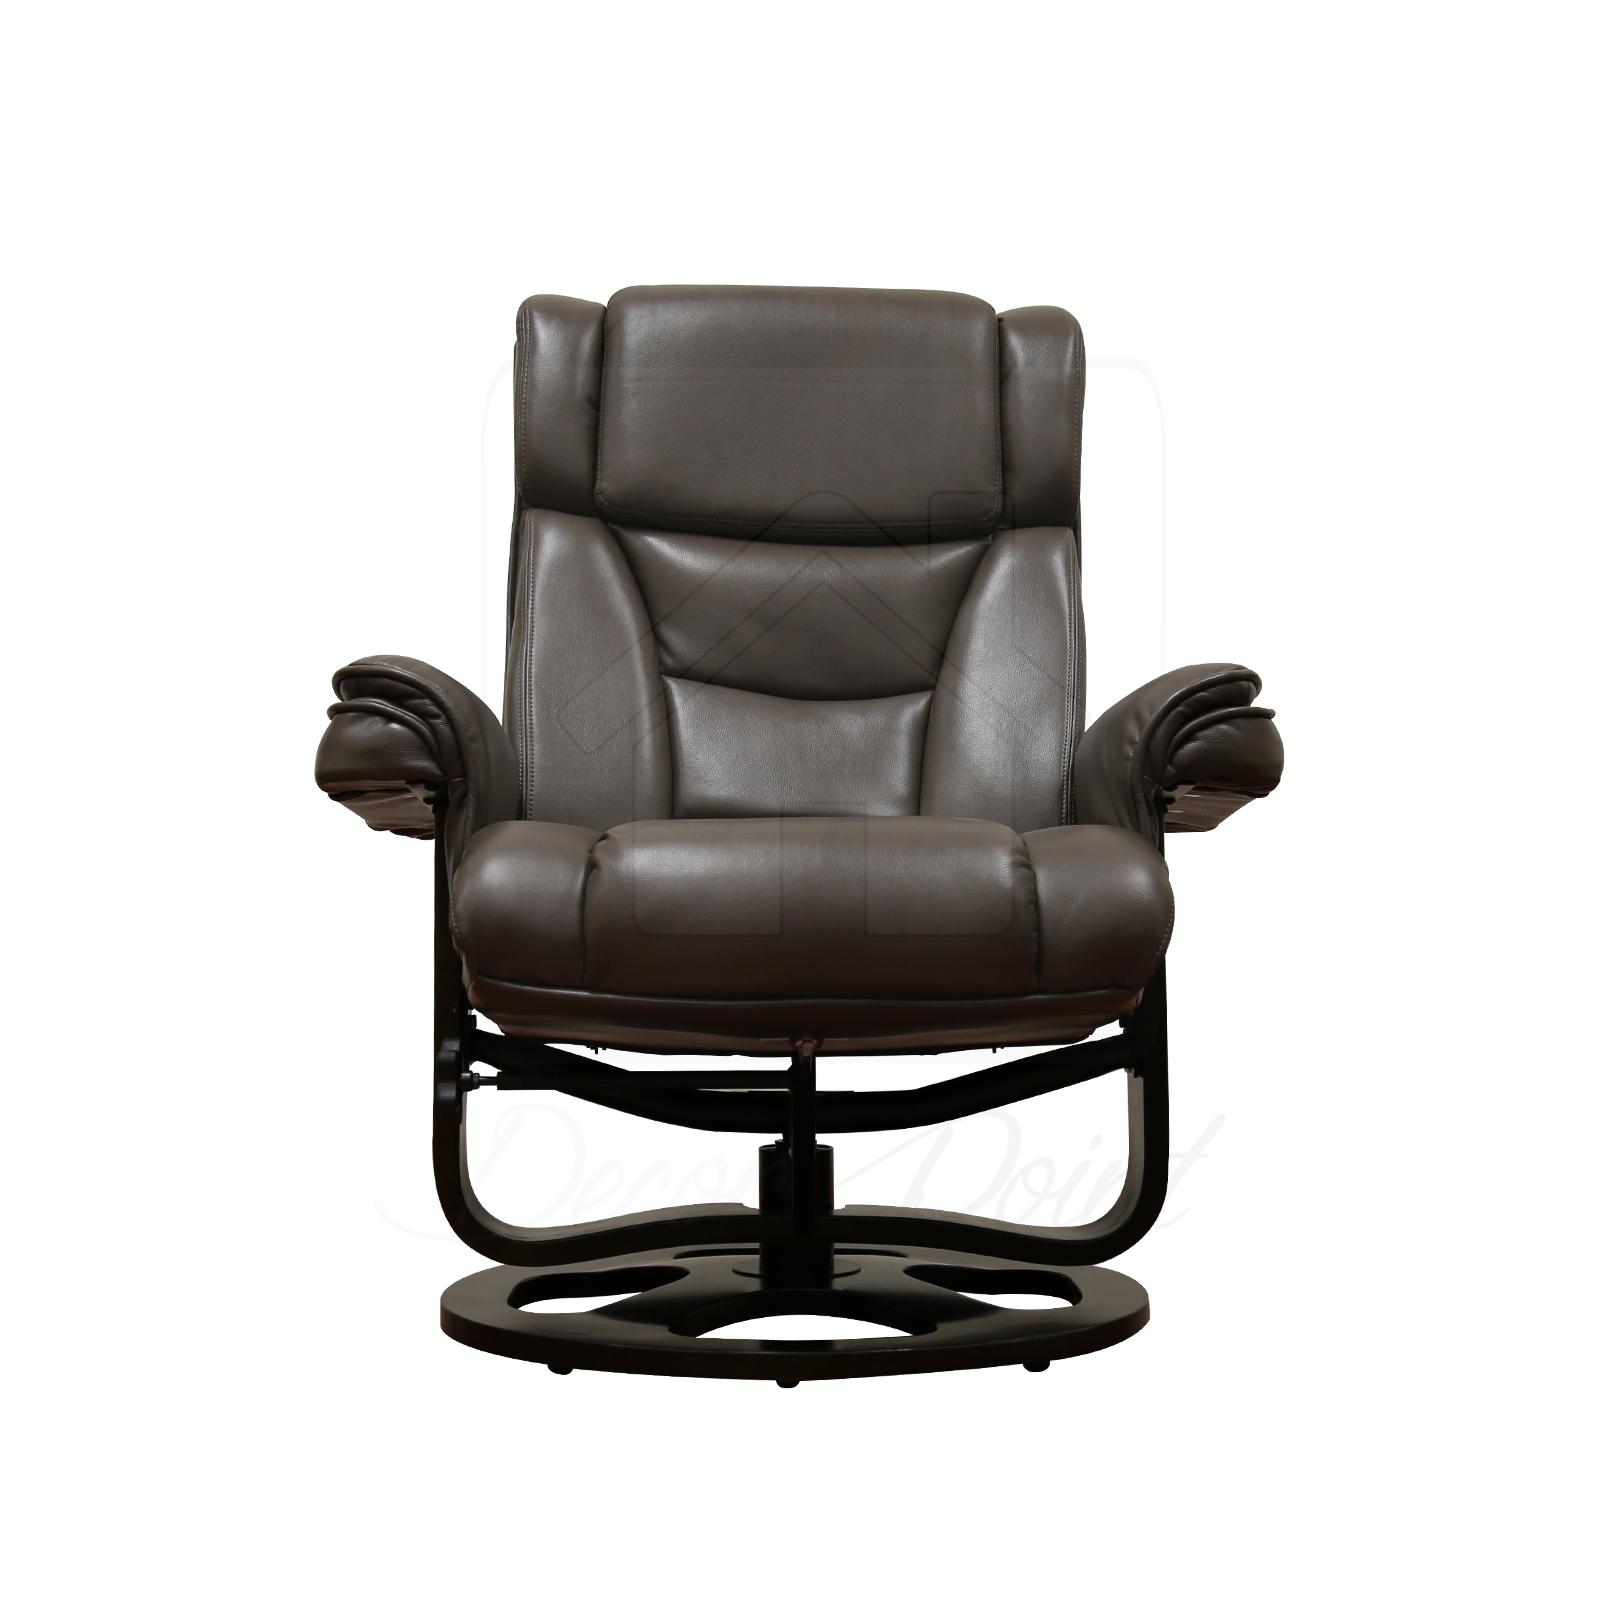 Monash Leather Air Camel 360 Degree Swivel Living Room Recliner Chair Ottoman Ebay